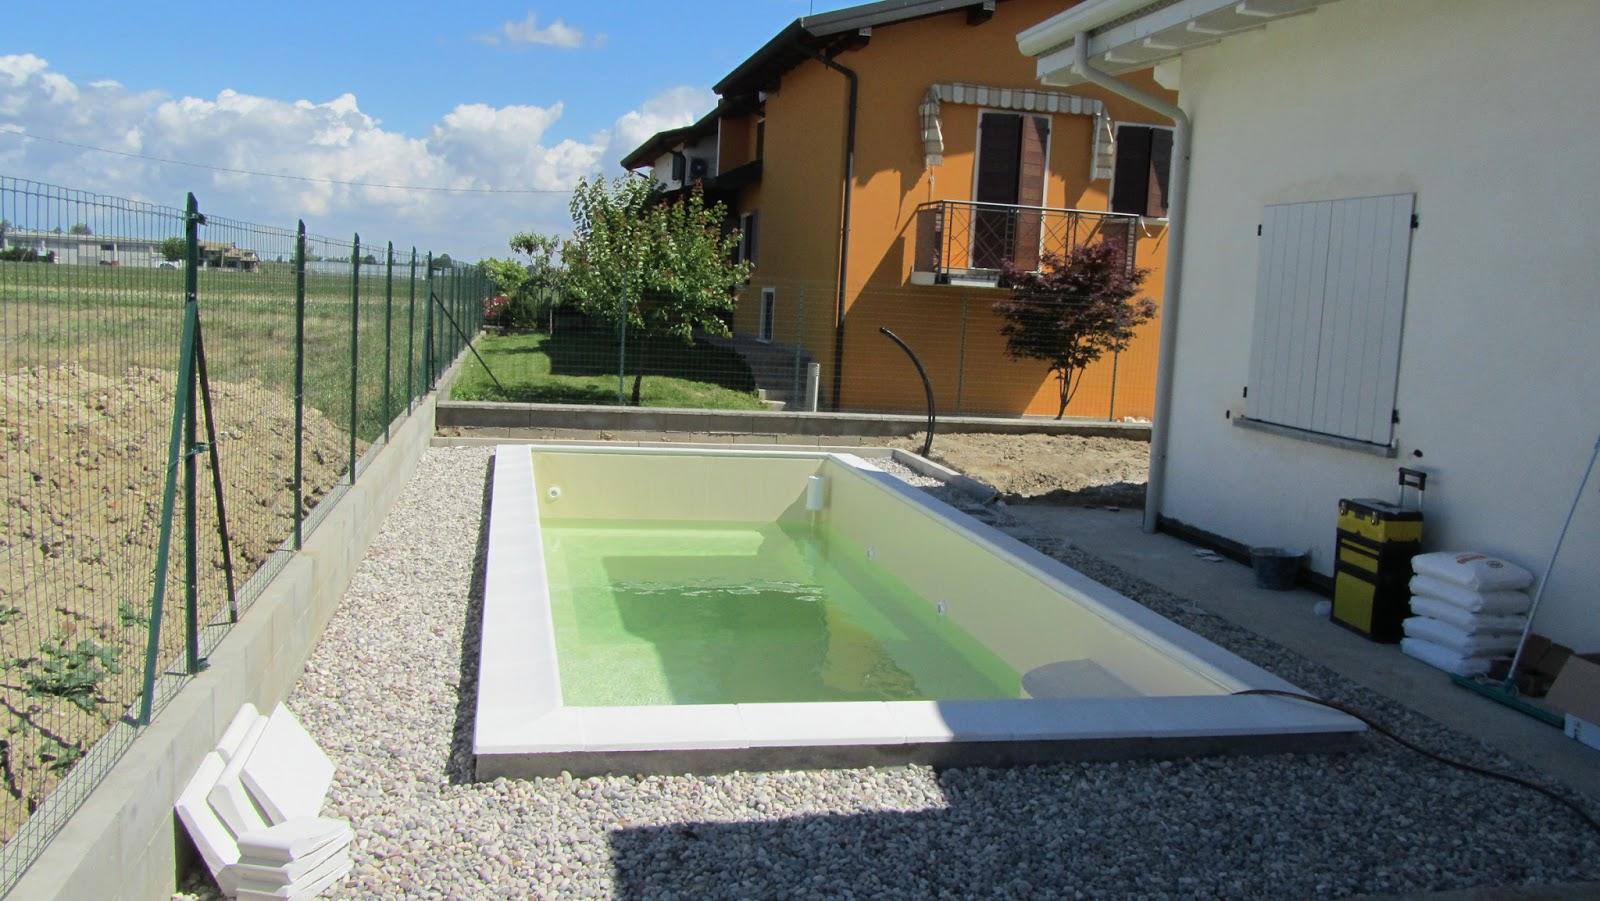 Piscine laghetto news blog speciale cantieri piscine opera for Piscine per pesci